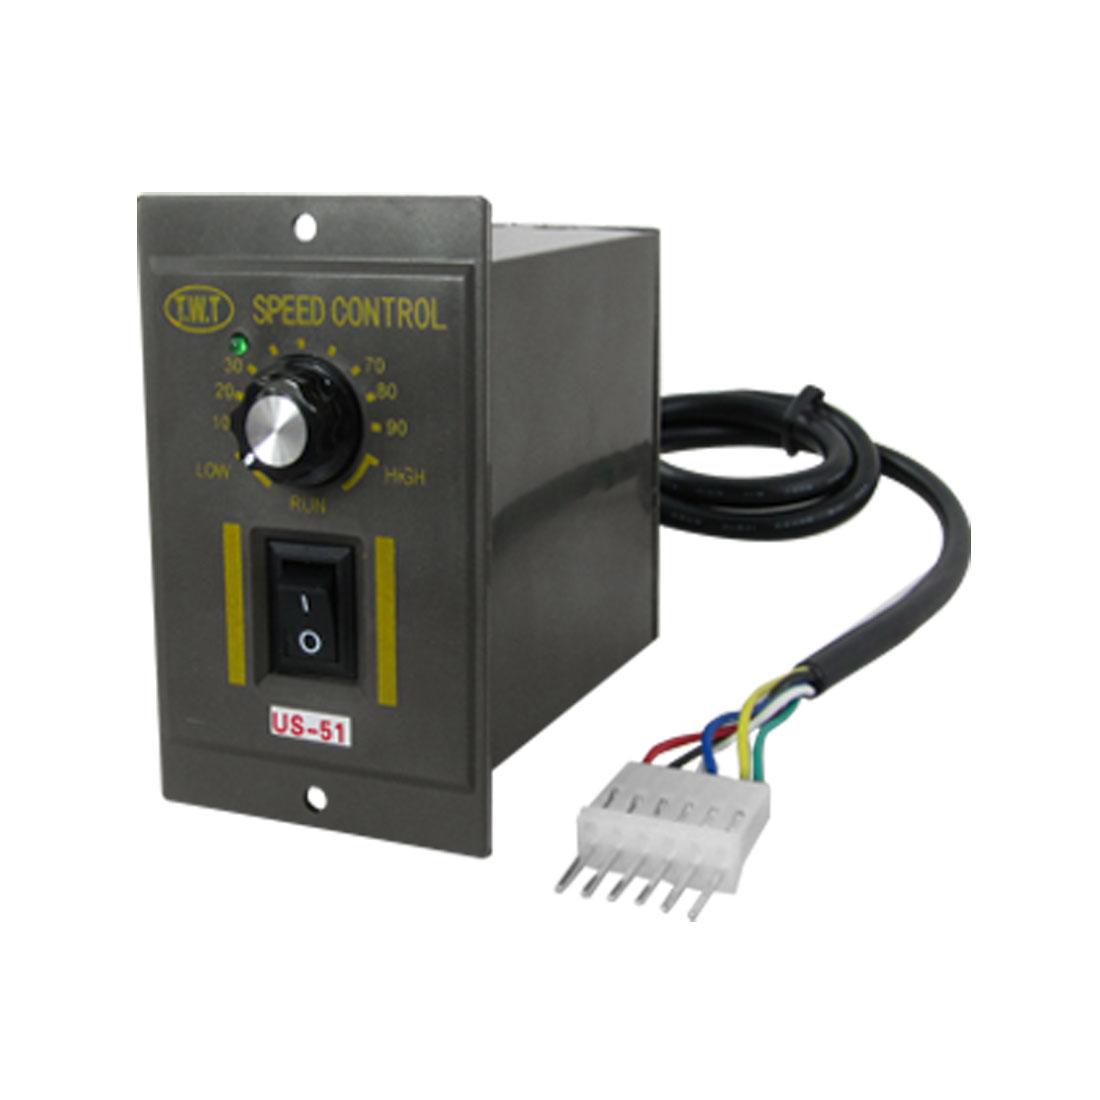 US-51 6W AC 110V 6 Pins Plug Motor Speed Controllor